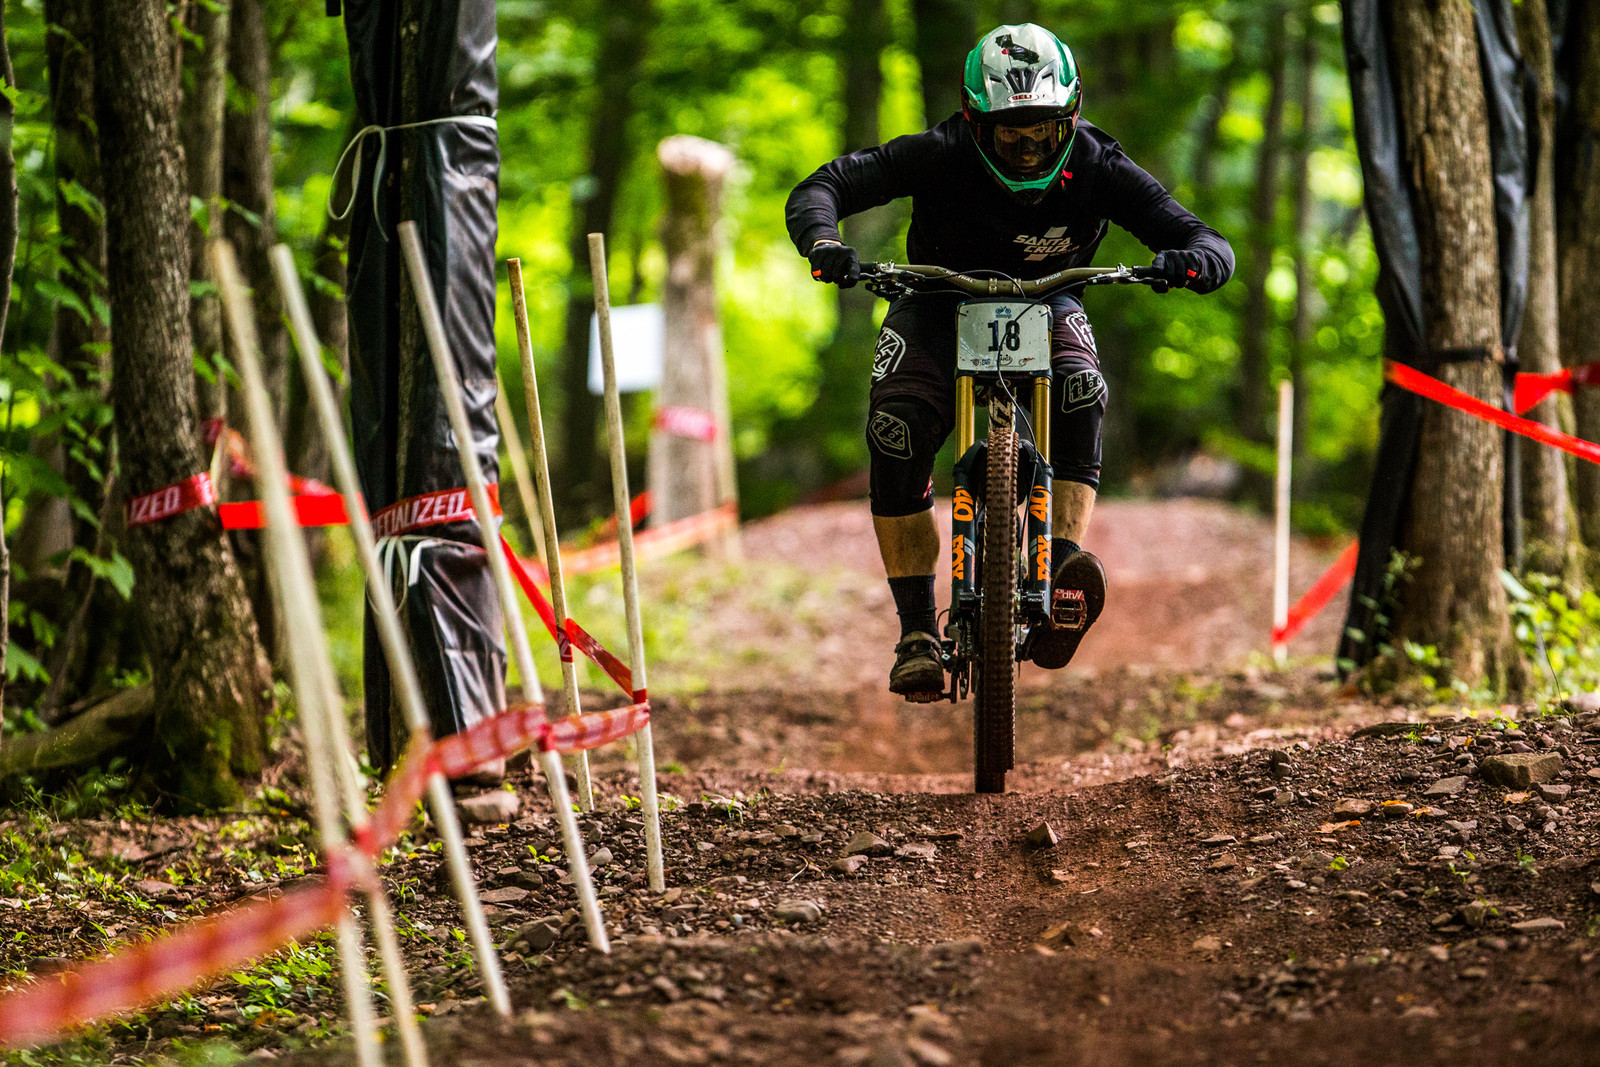 Kiran MacKinnon - RACE DAY GALLERY - 2017 Pro GRT, Windham, NY - Mountain Biking Pictures - Vital MTB